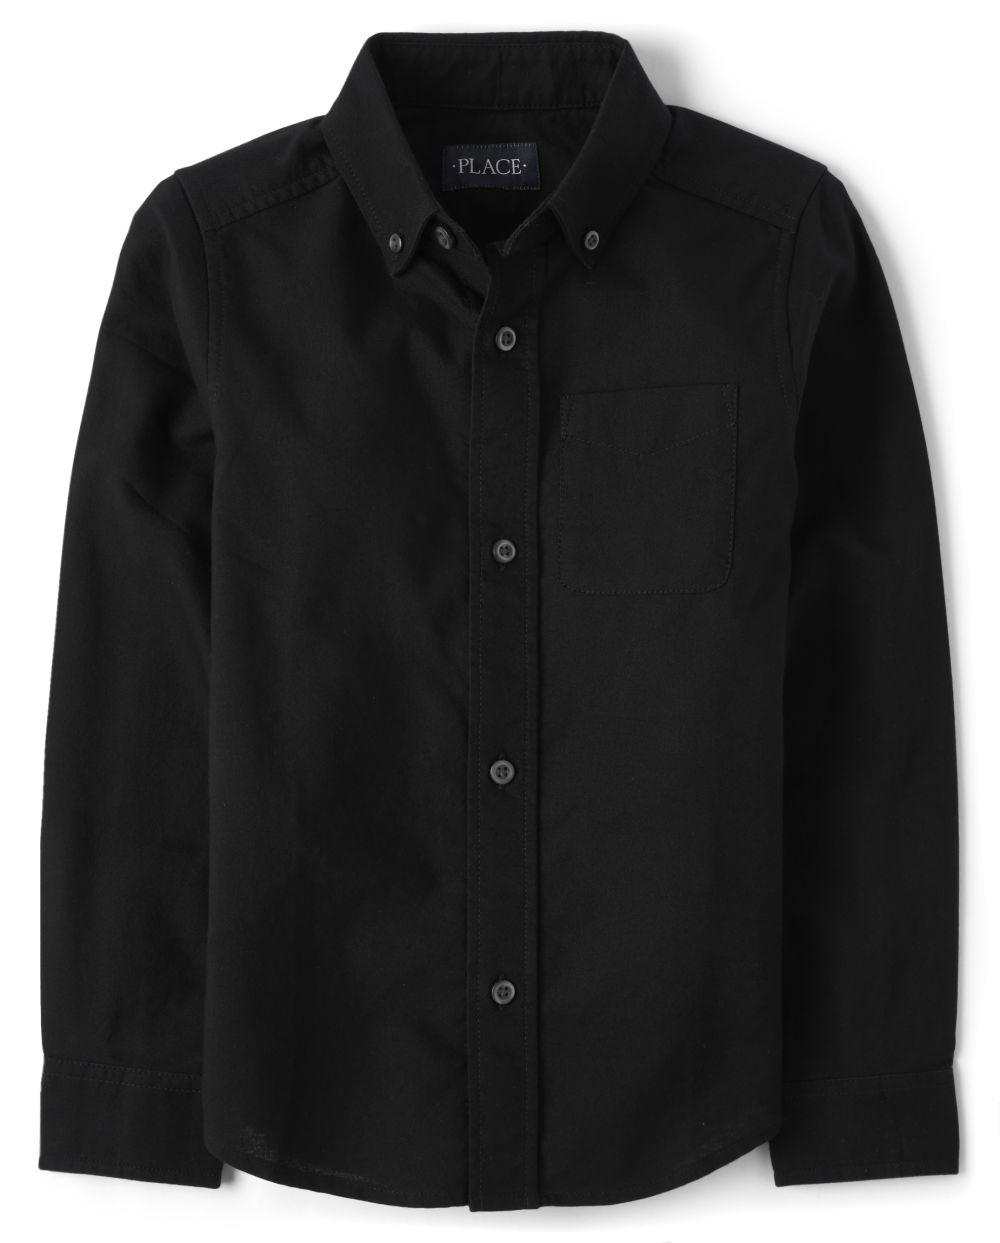 Boys Uniform Oxford Button Down Shirt